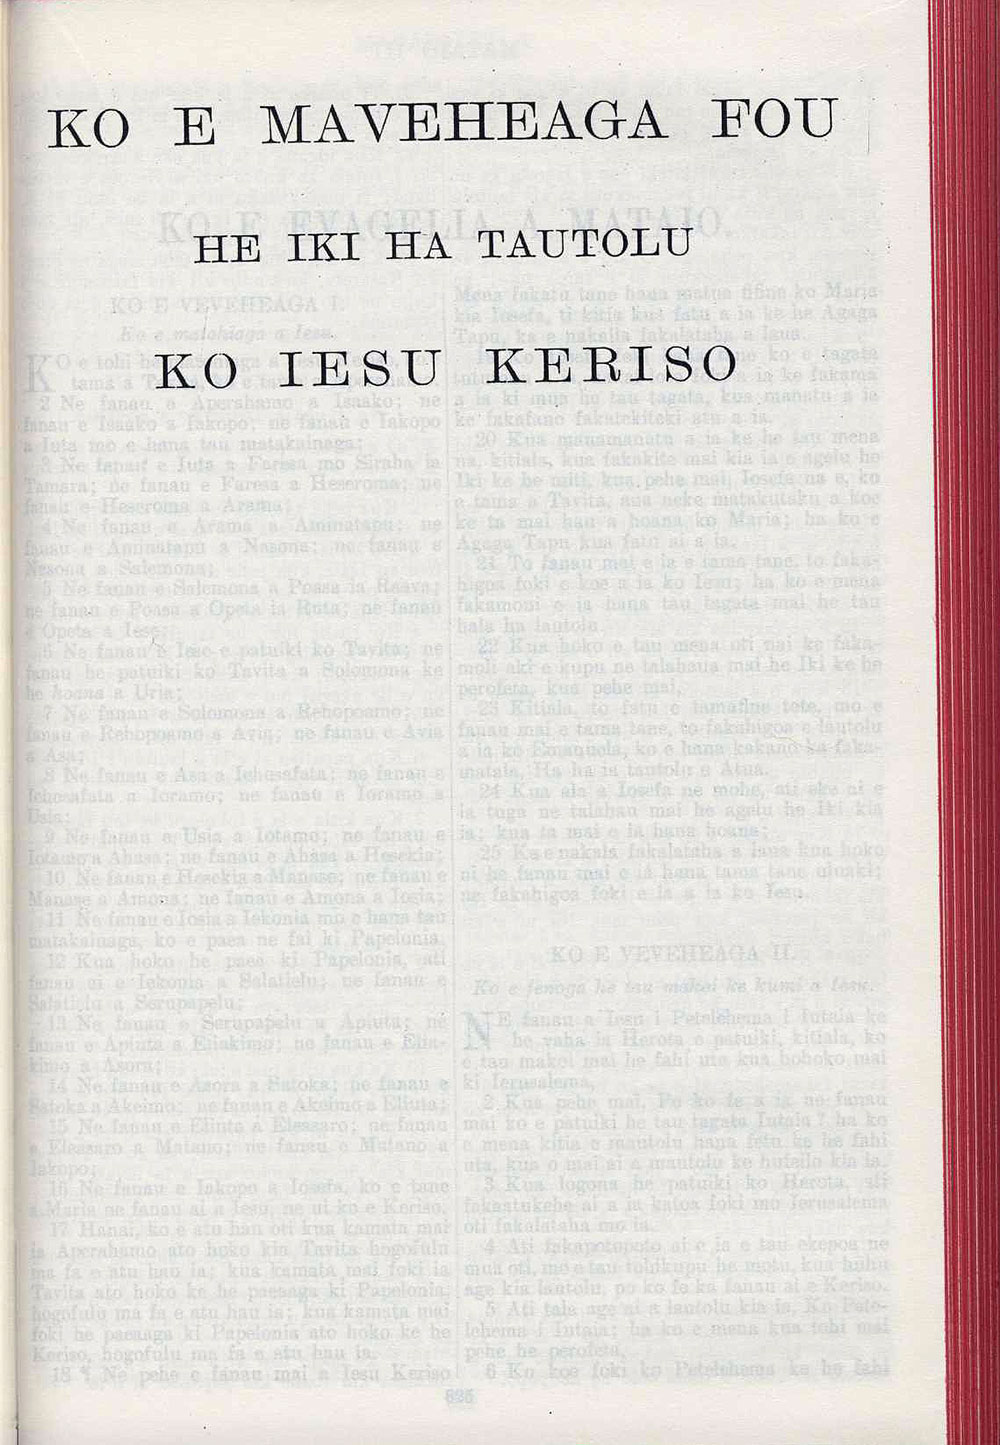 [Bible in Niue]. <em>Ko e Tohi Tapu: ko e Maveheaga Tuai mo e Maveheaga Fou.</em> London: British and Foreign Bible Society, 1966.